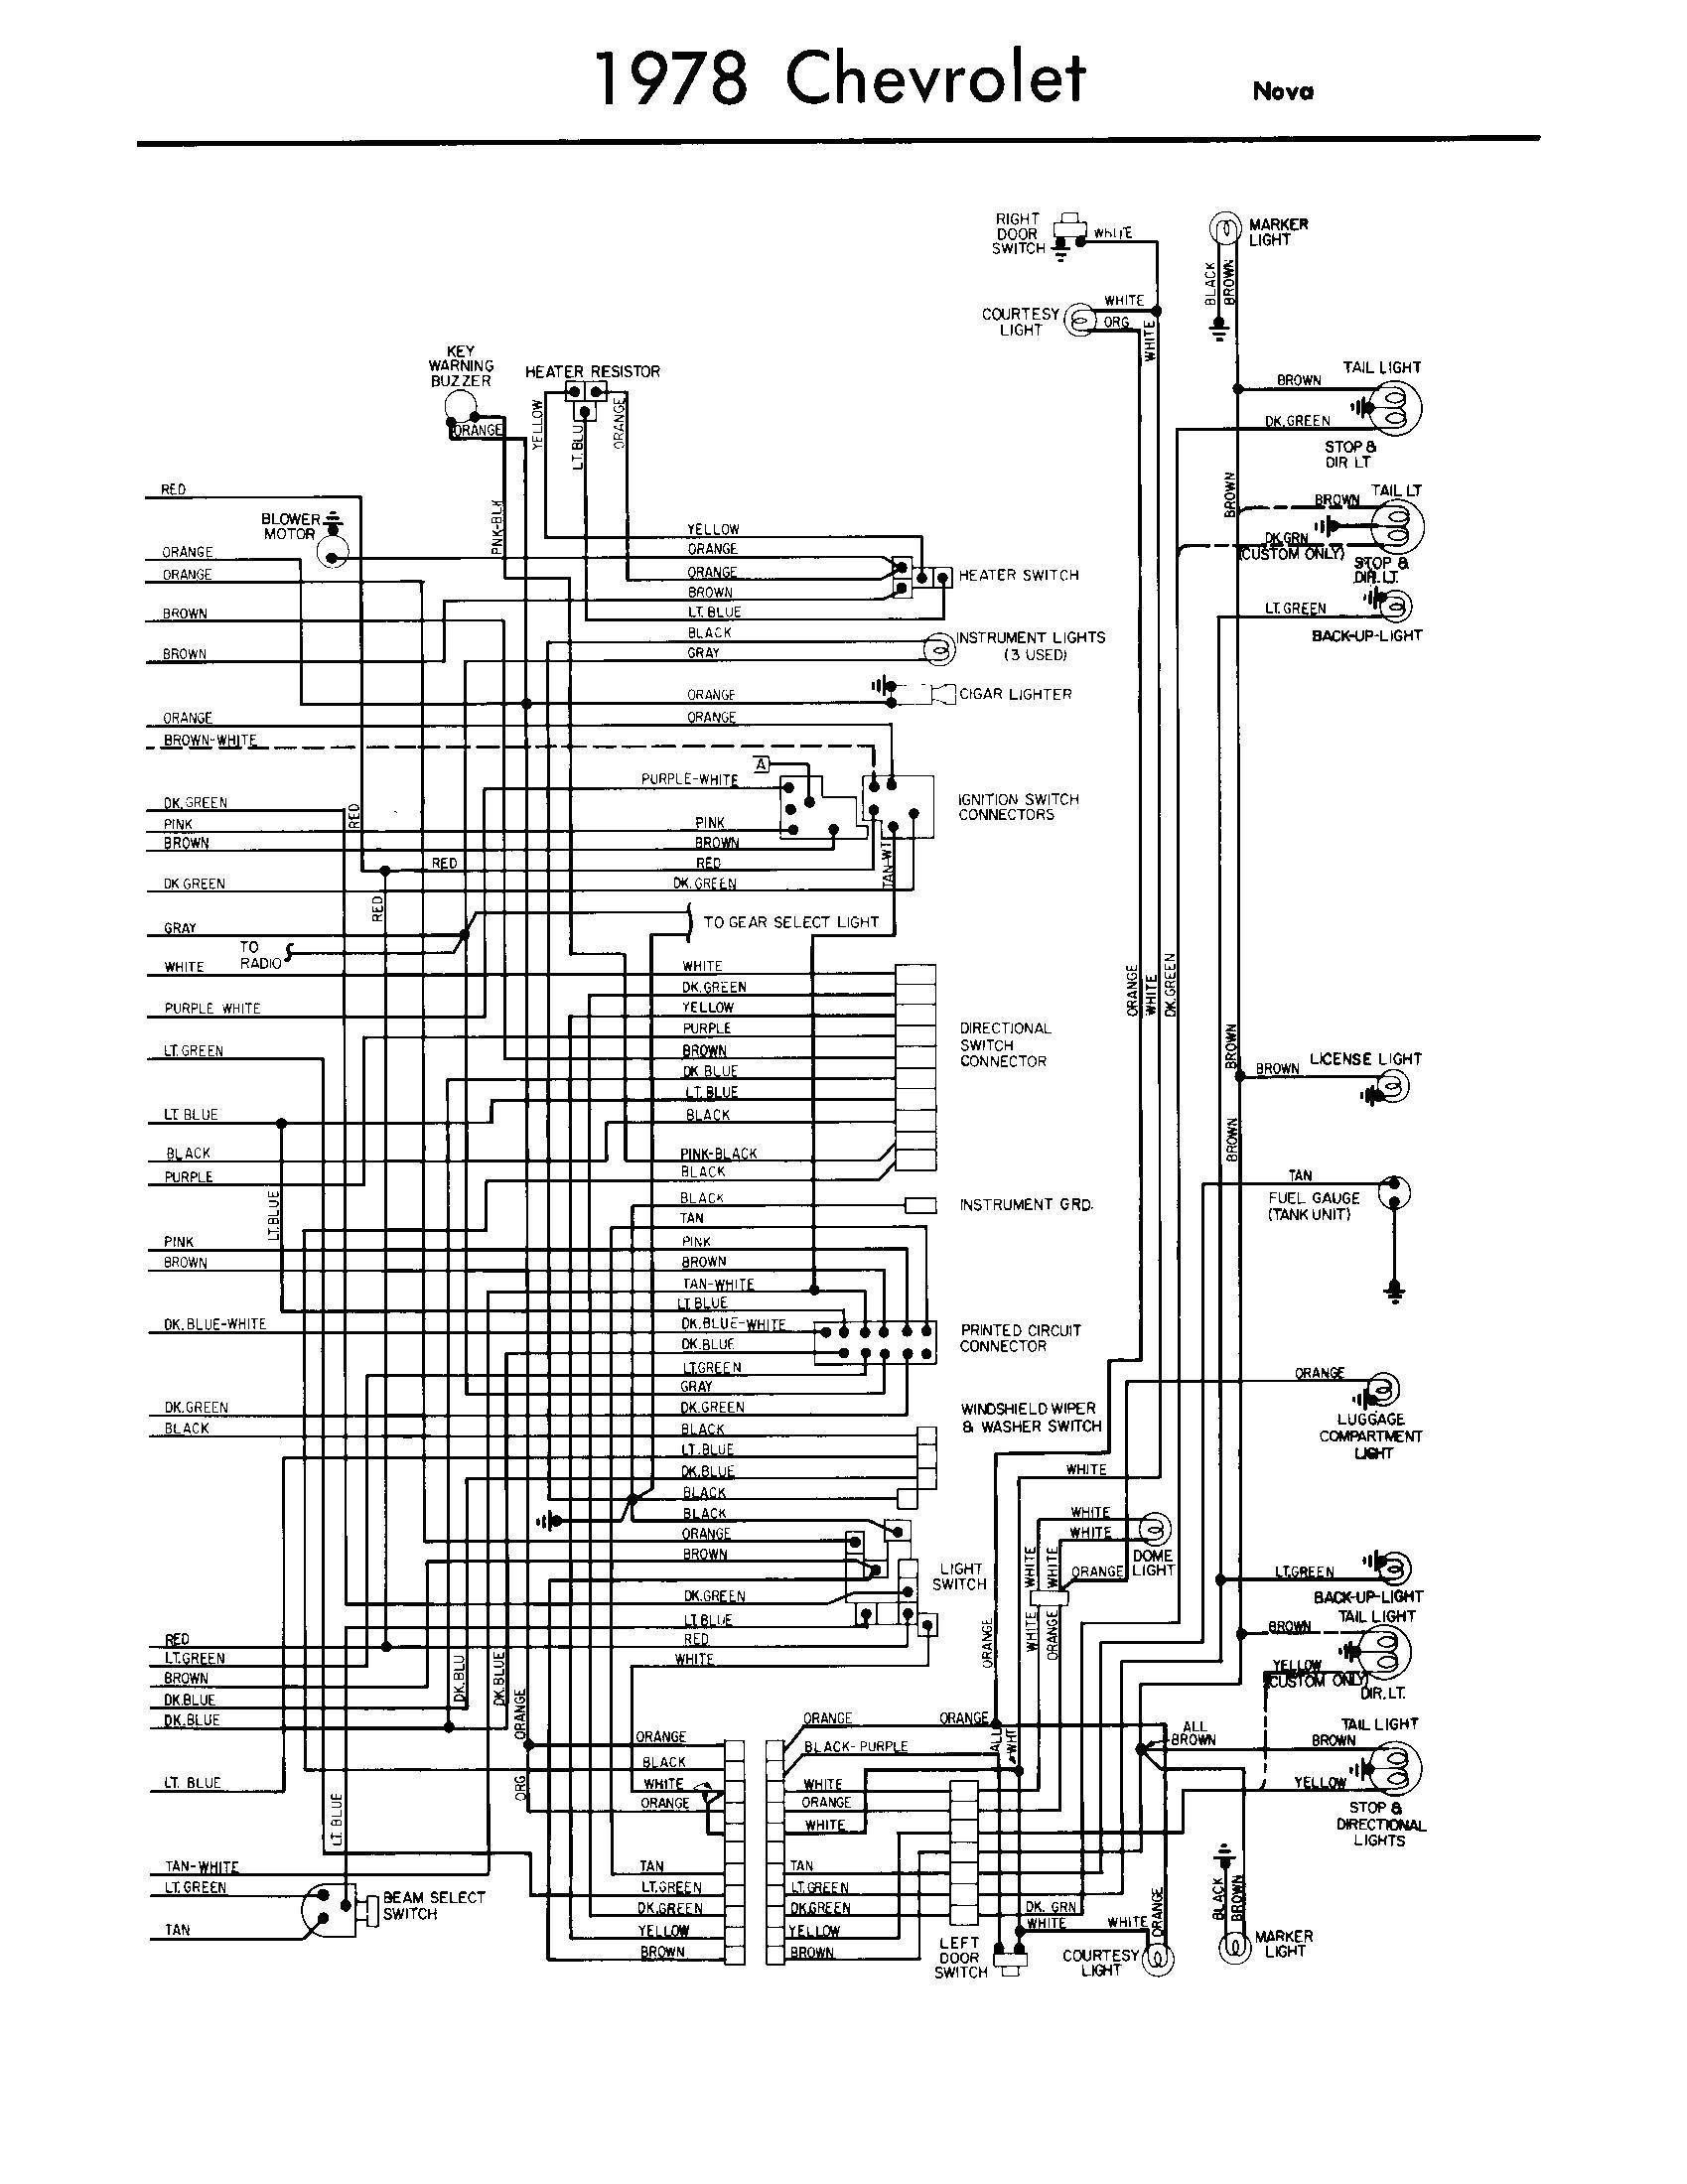 c60 wiring diagram wiring library c60 wiring diagram wiring diagramelectrical wiring diagram 1979 gmc c60 manual